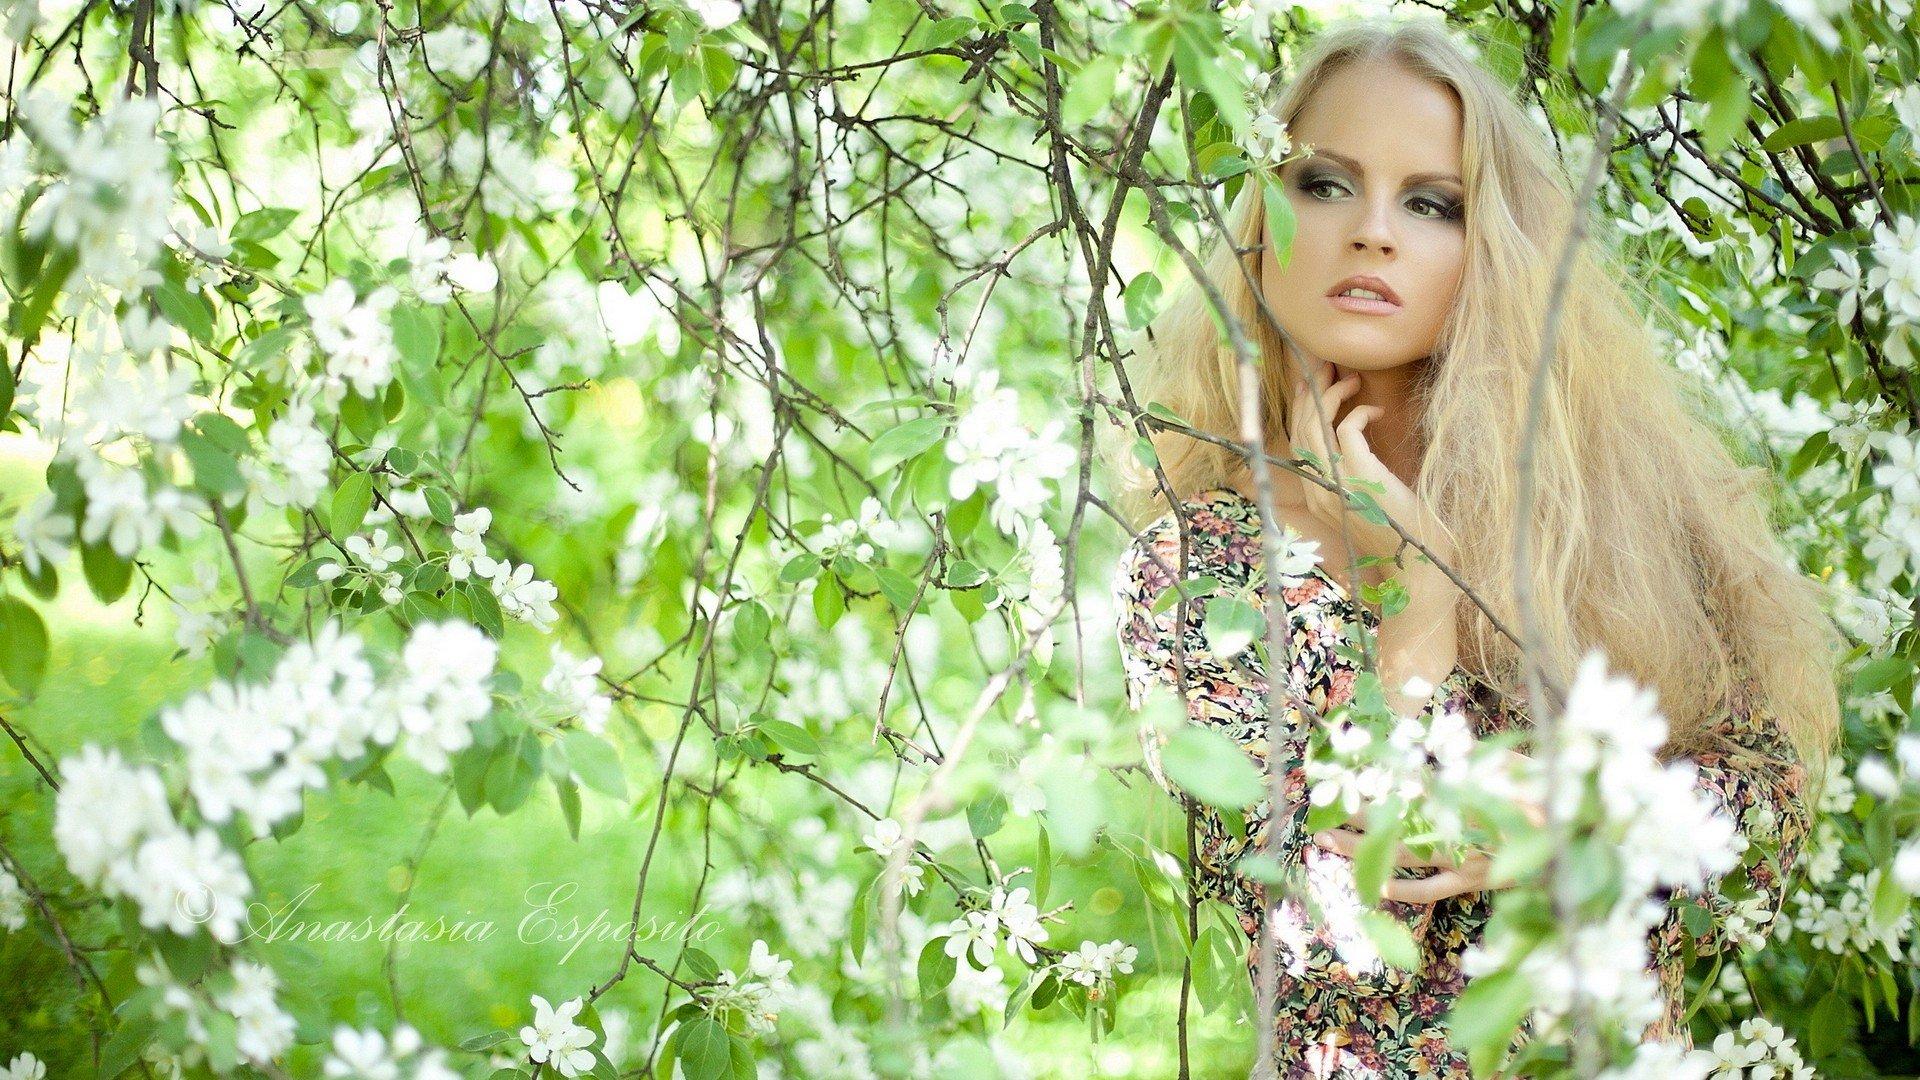 блондинка дерево поле blonde tree field  № 1377137 бесплатно